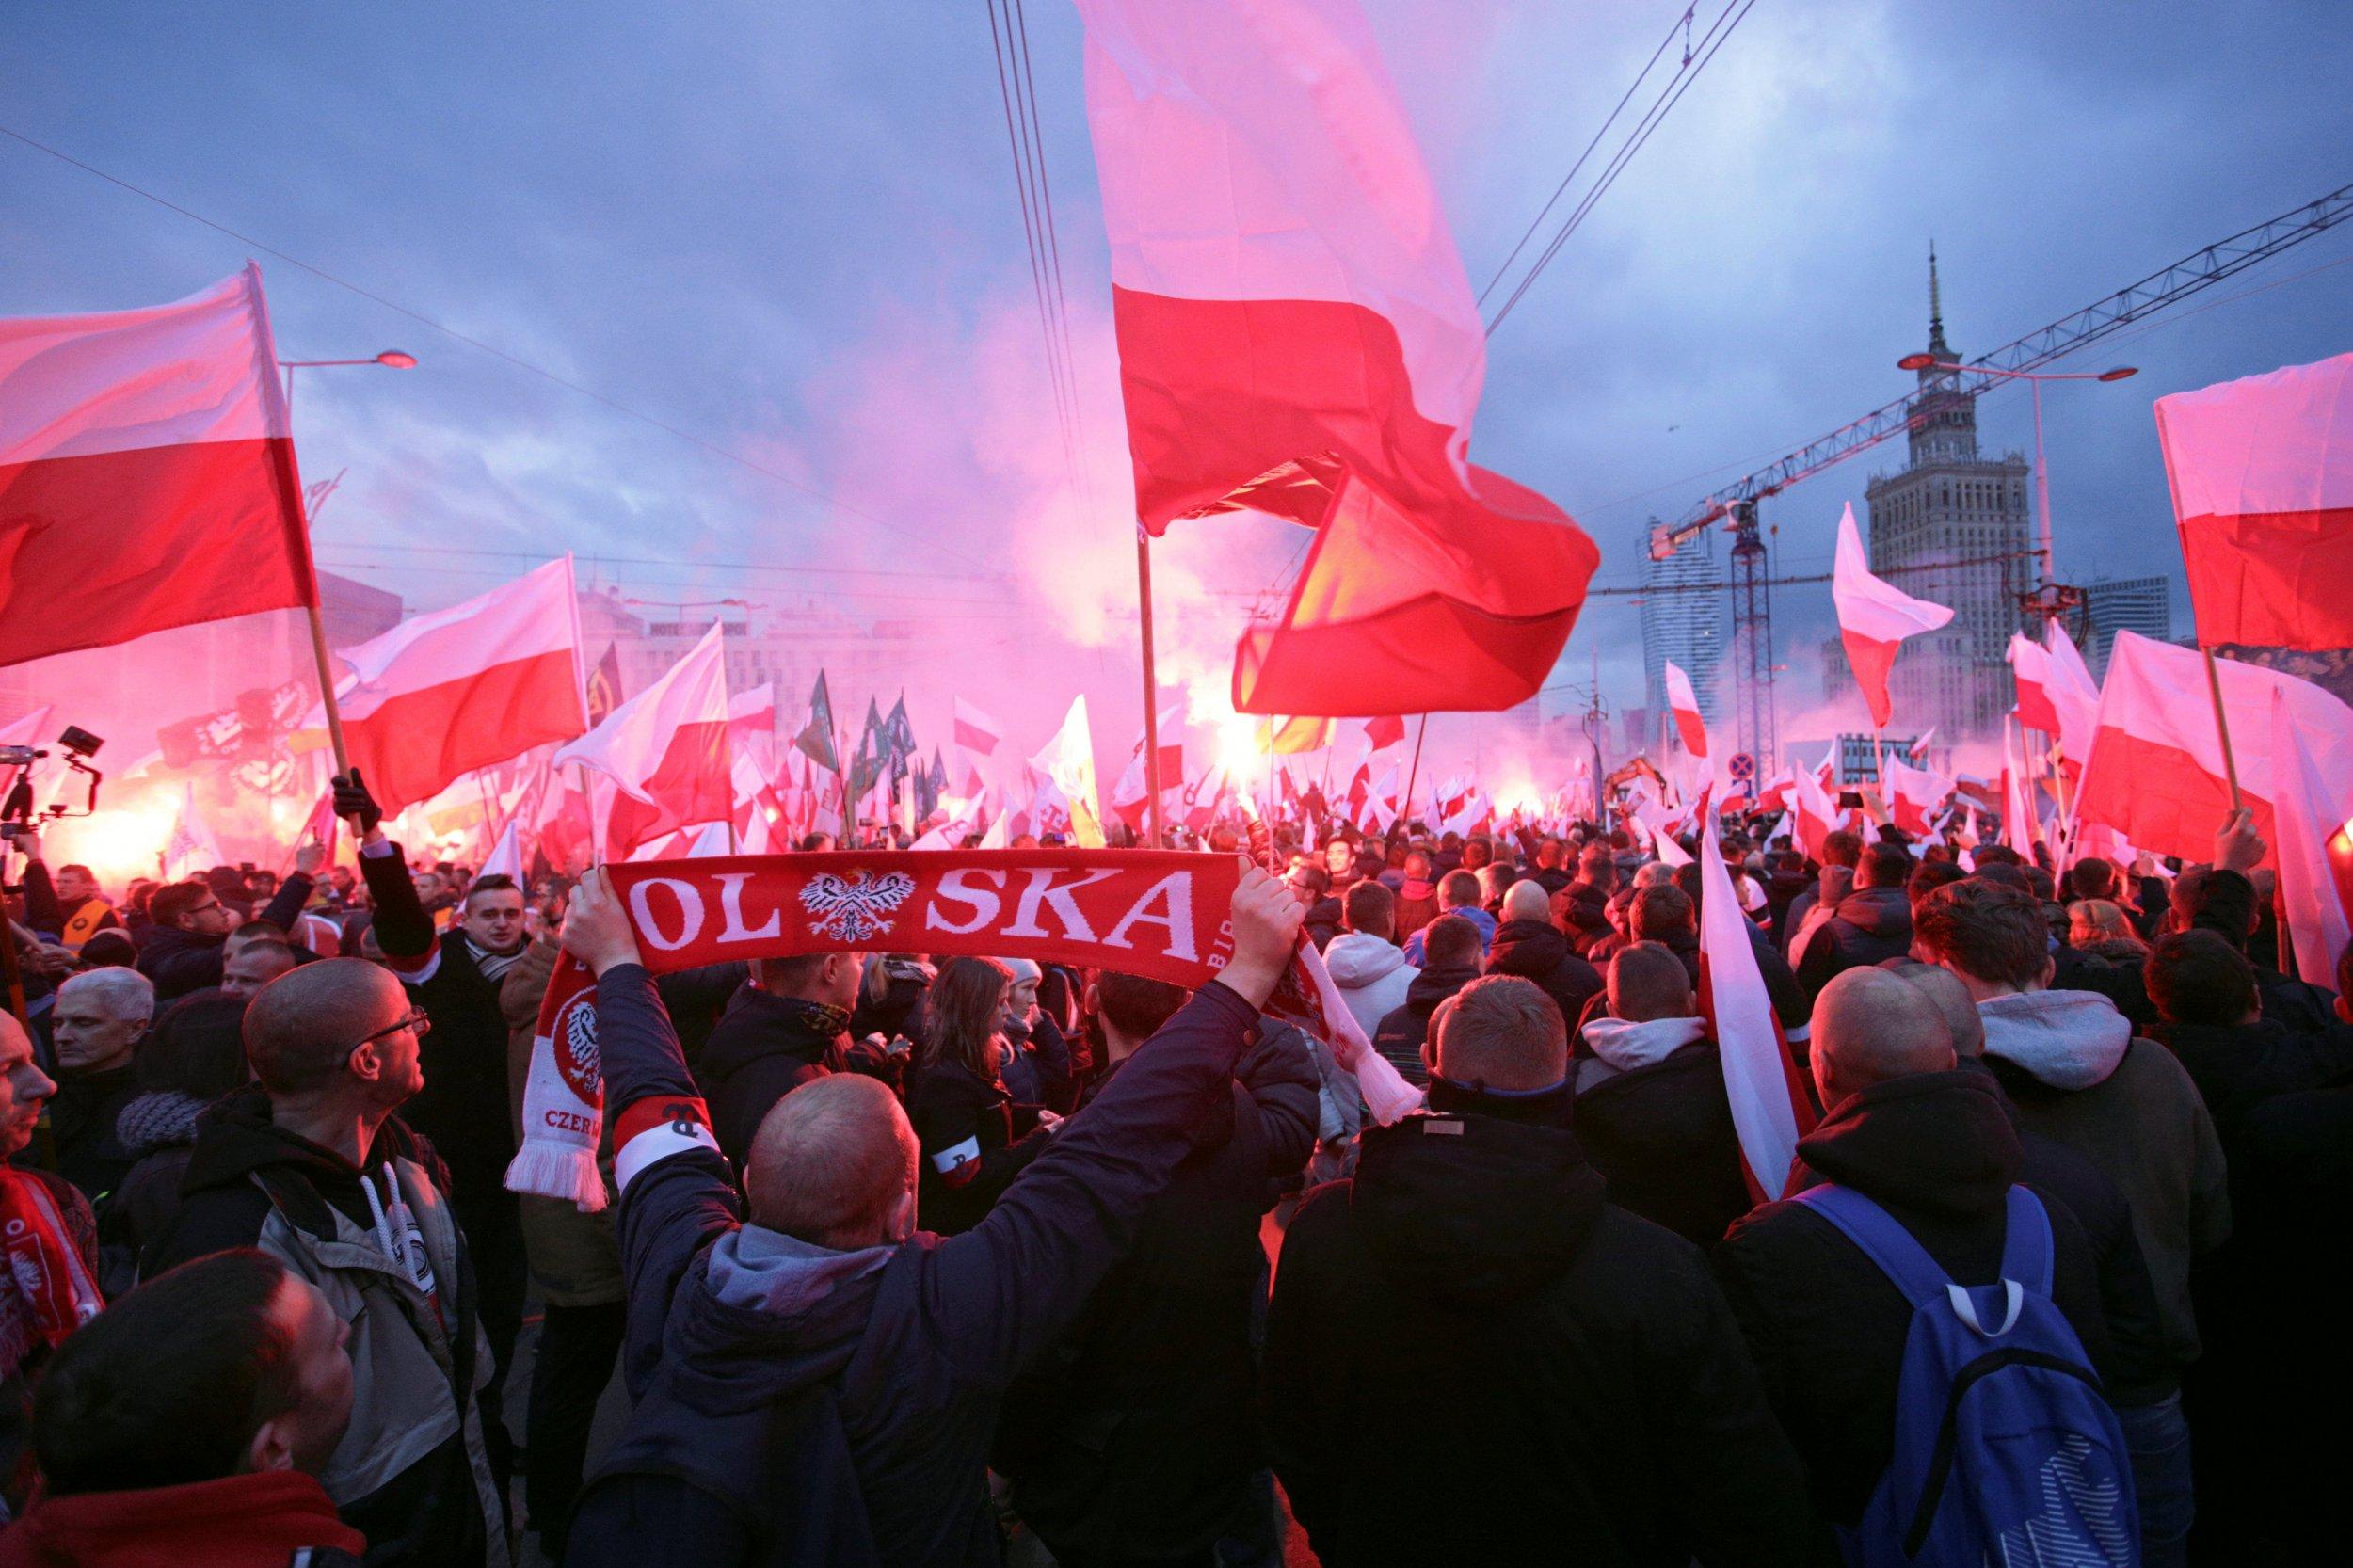 Warsaw rally